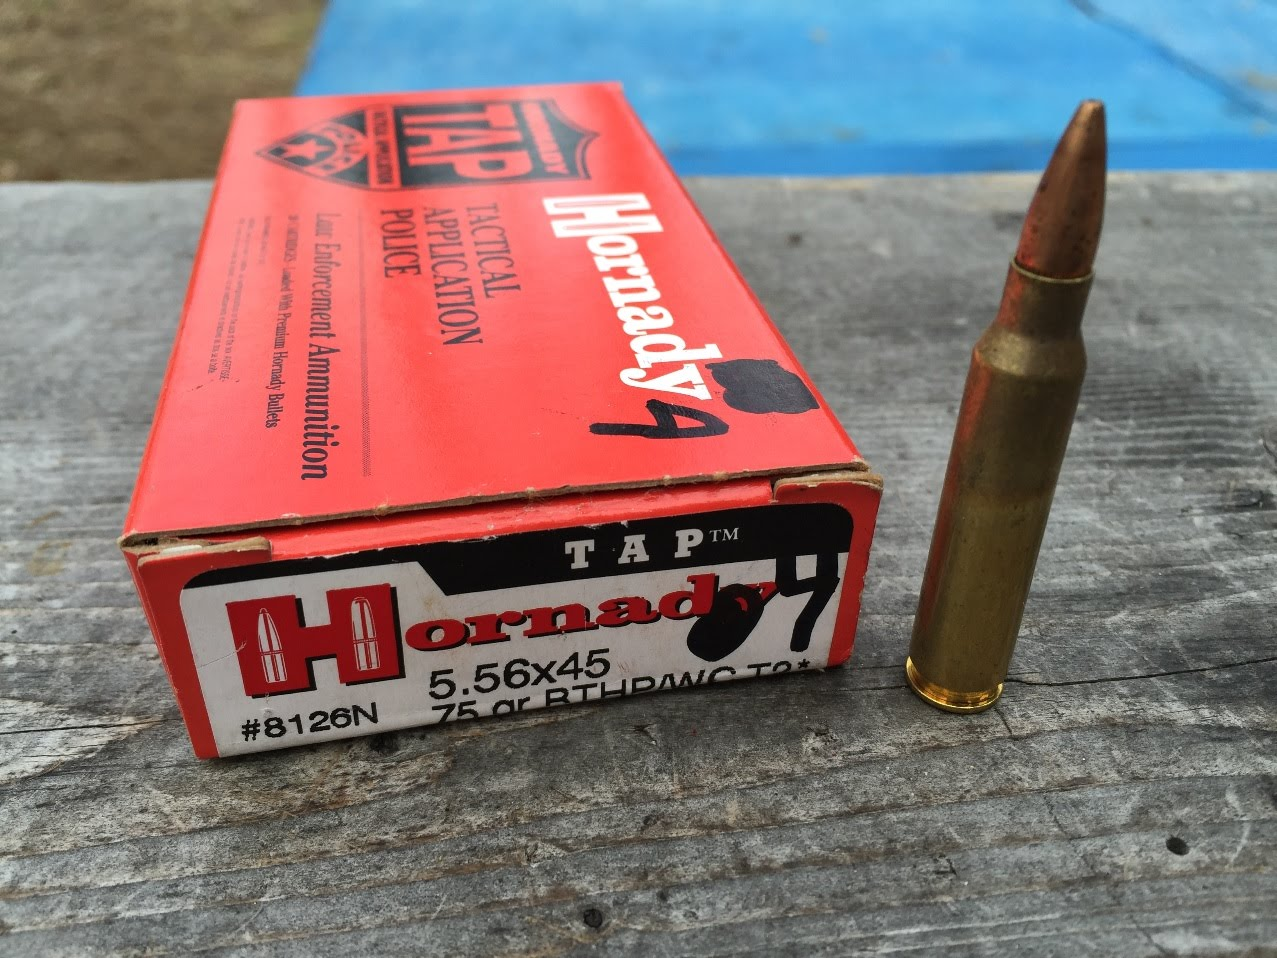 "5.56x45mm, 75gr BTHP T2*, Hornady TAP (8126N), Velocity Test, 20"" Barrel"